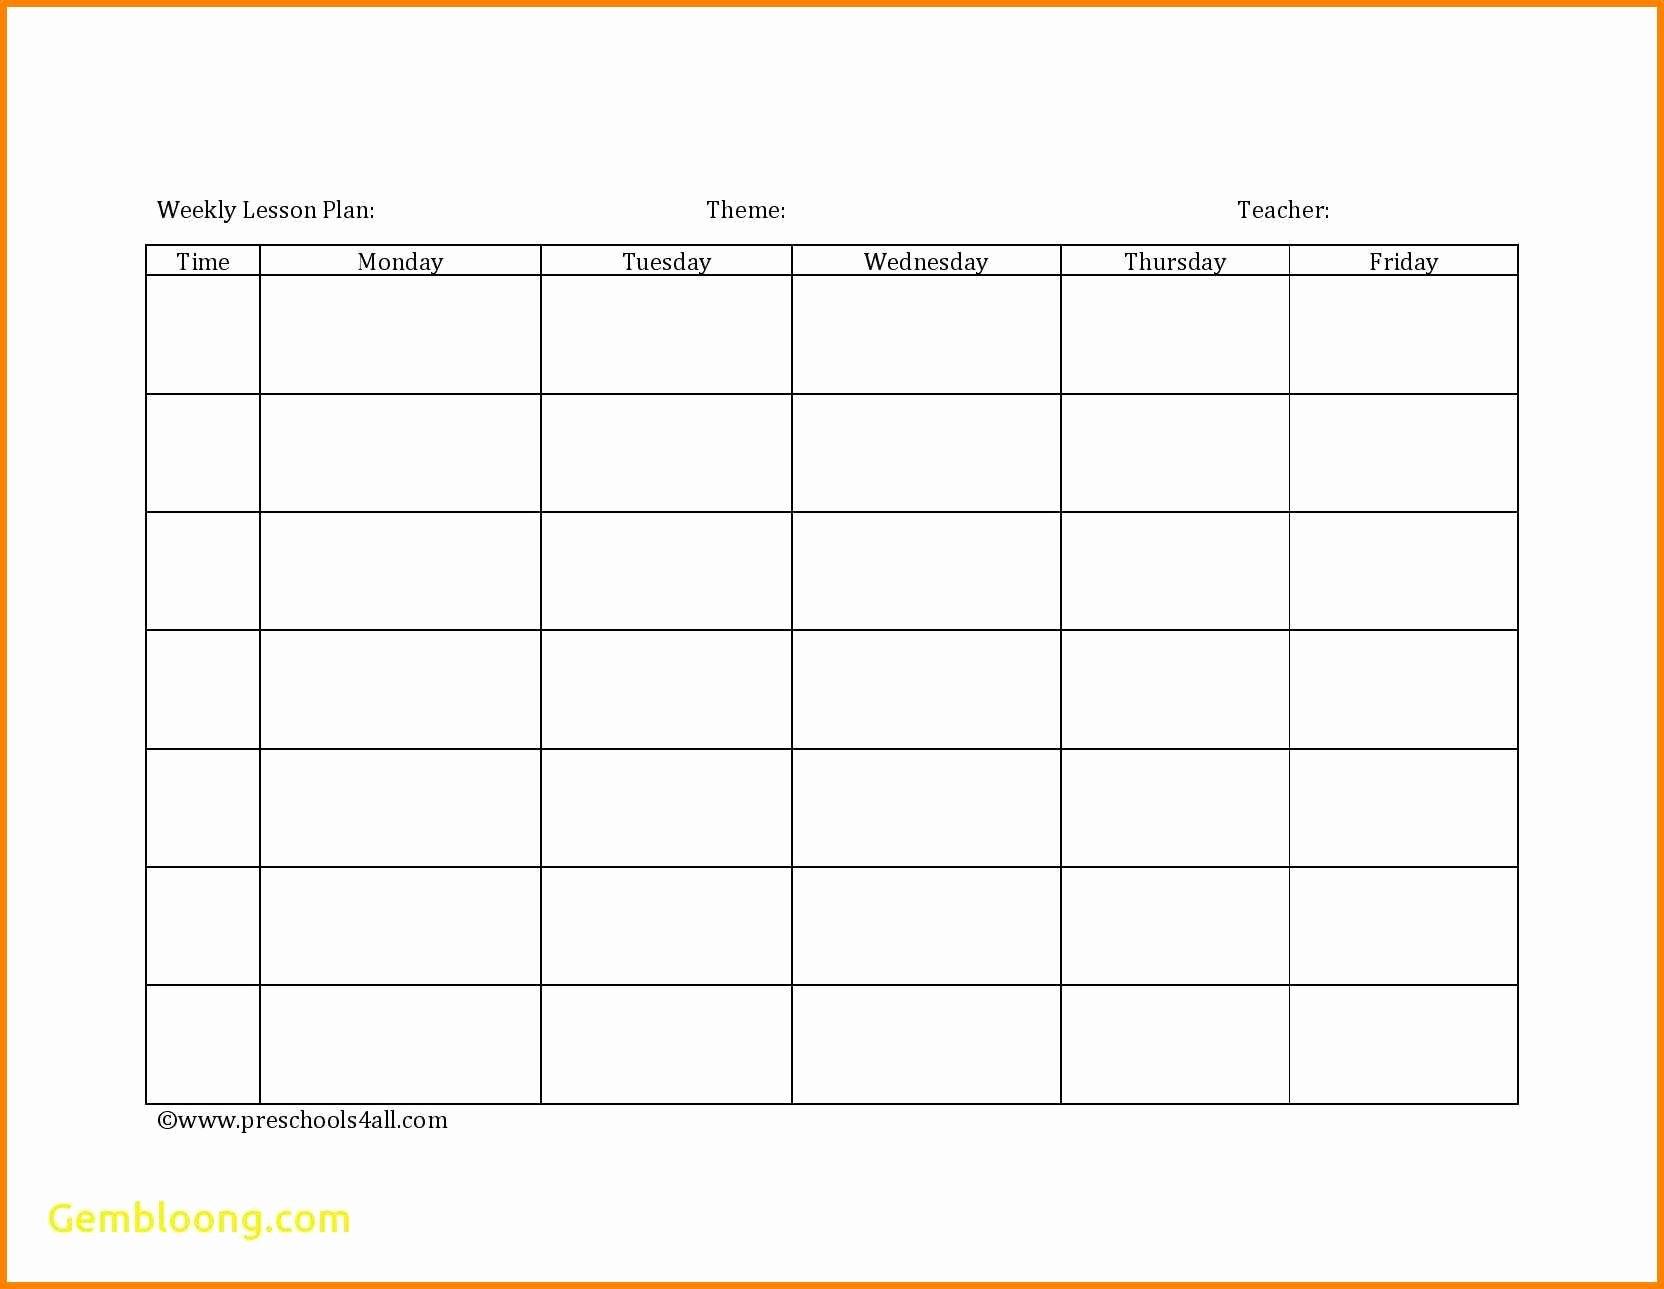 Weekly Lesson Plan Template Pdf Elegant 7 Editable Weekly Lesson Plan Template